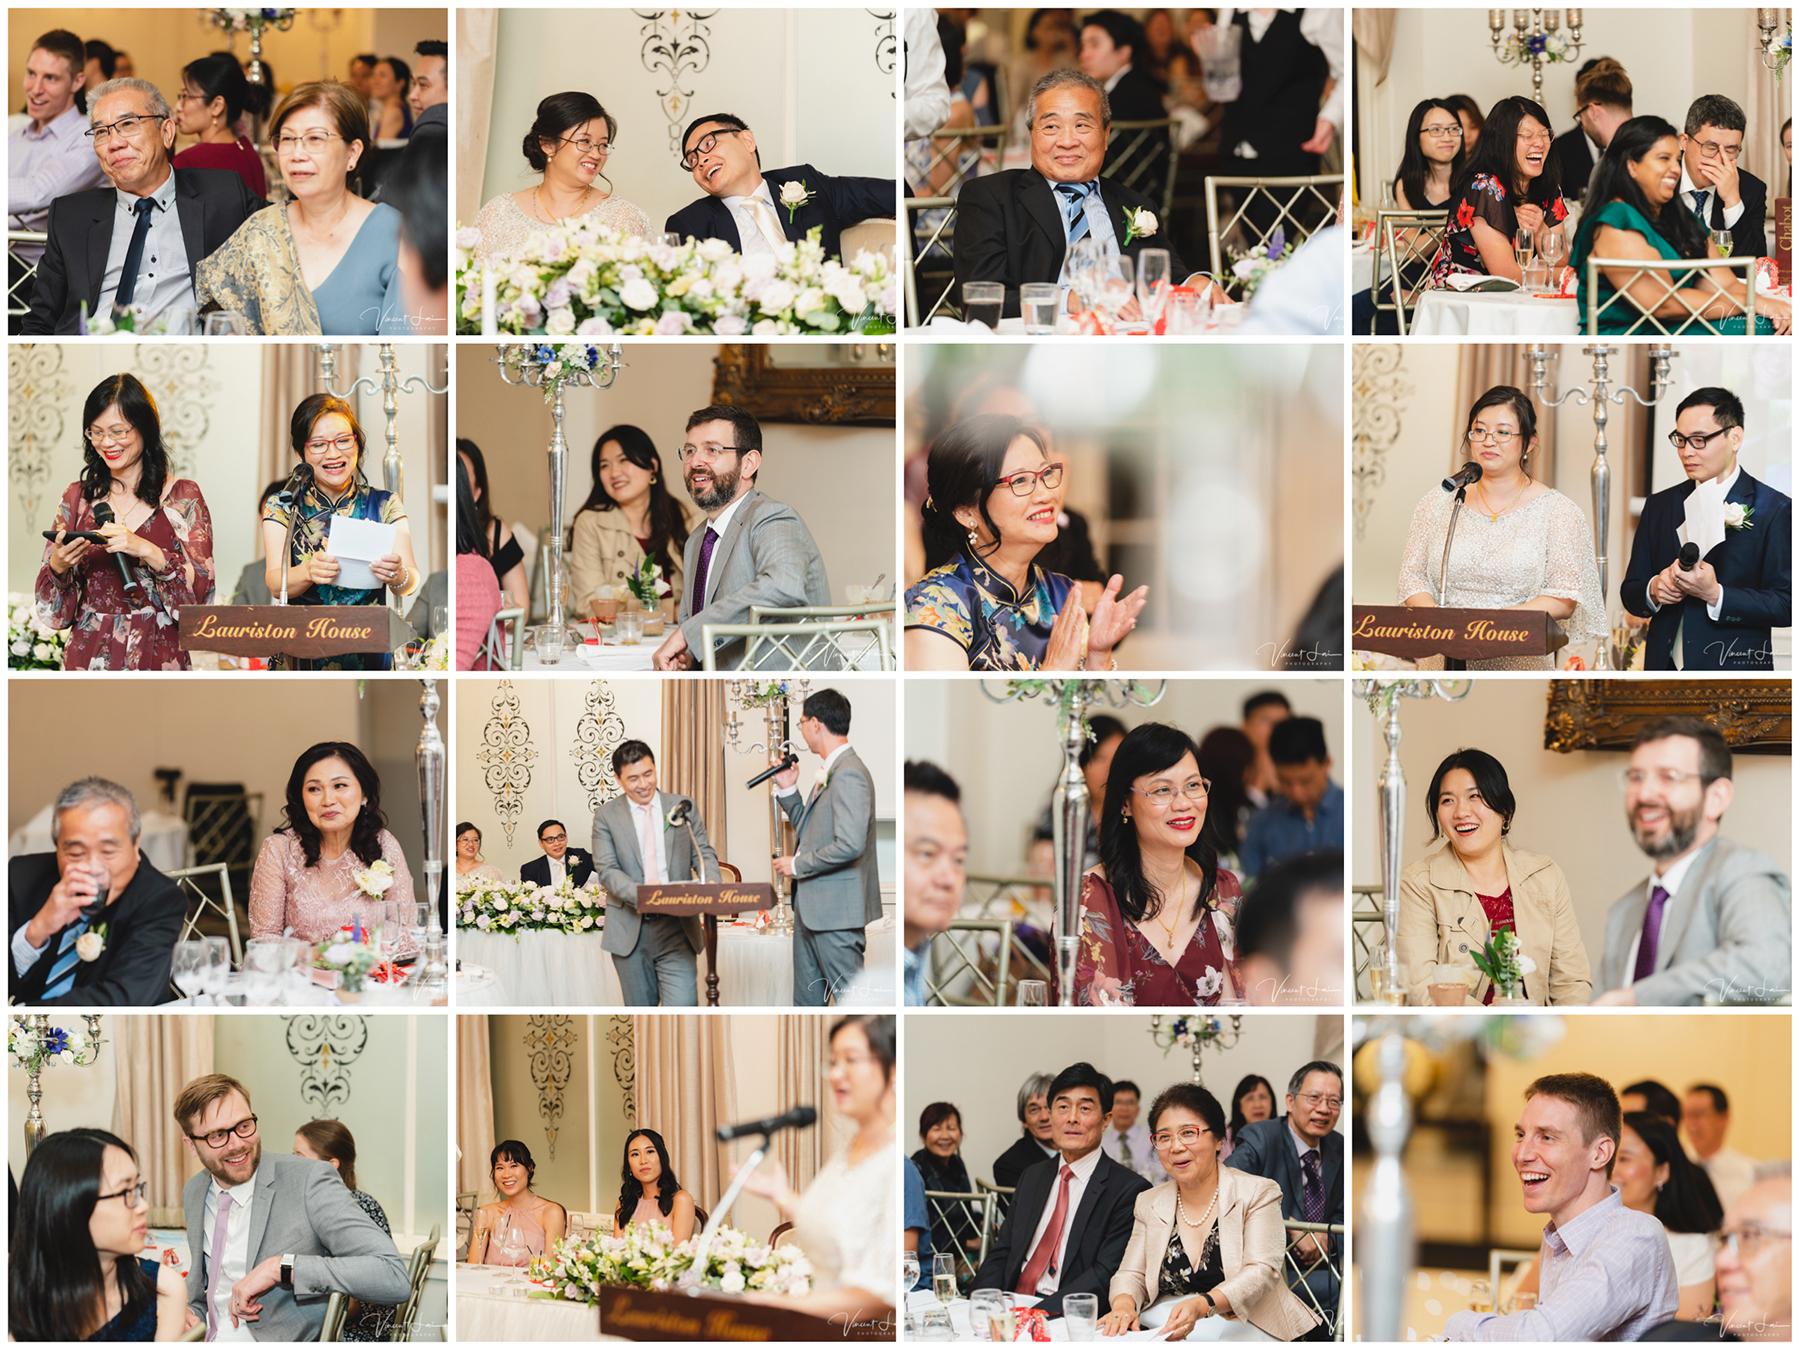 Lauriston House Wedding Reception